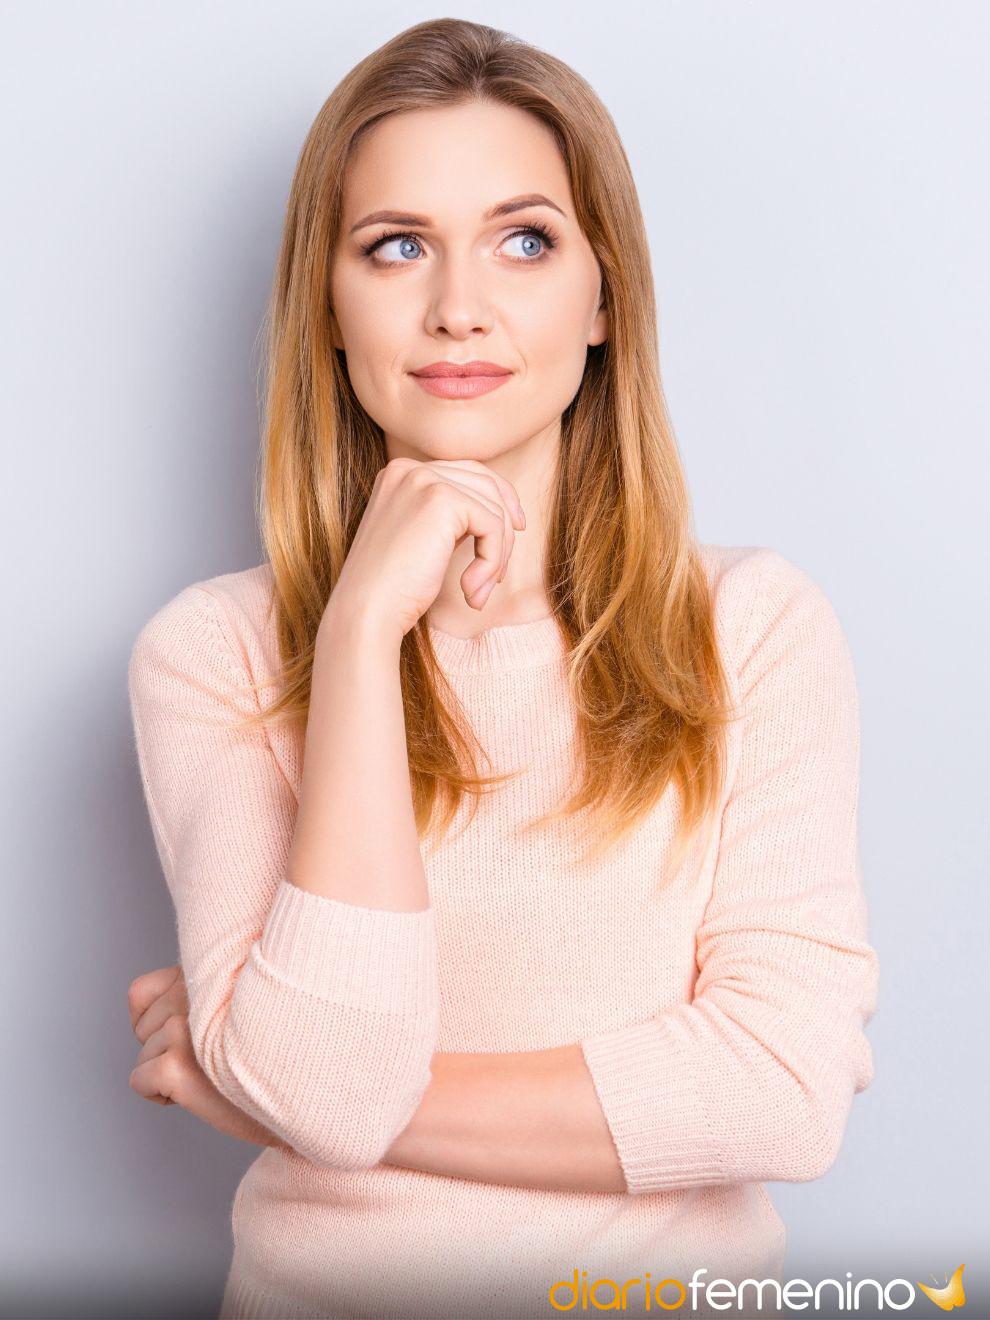 Tips de higiene íntima: higiene genital diaria